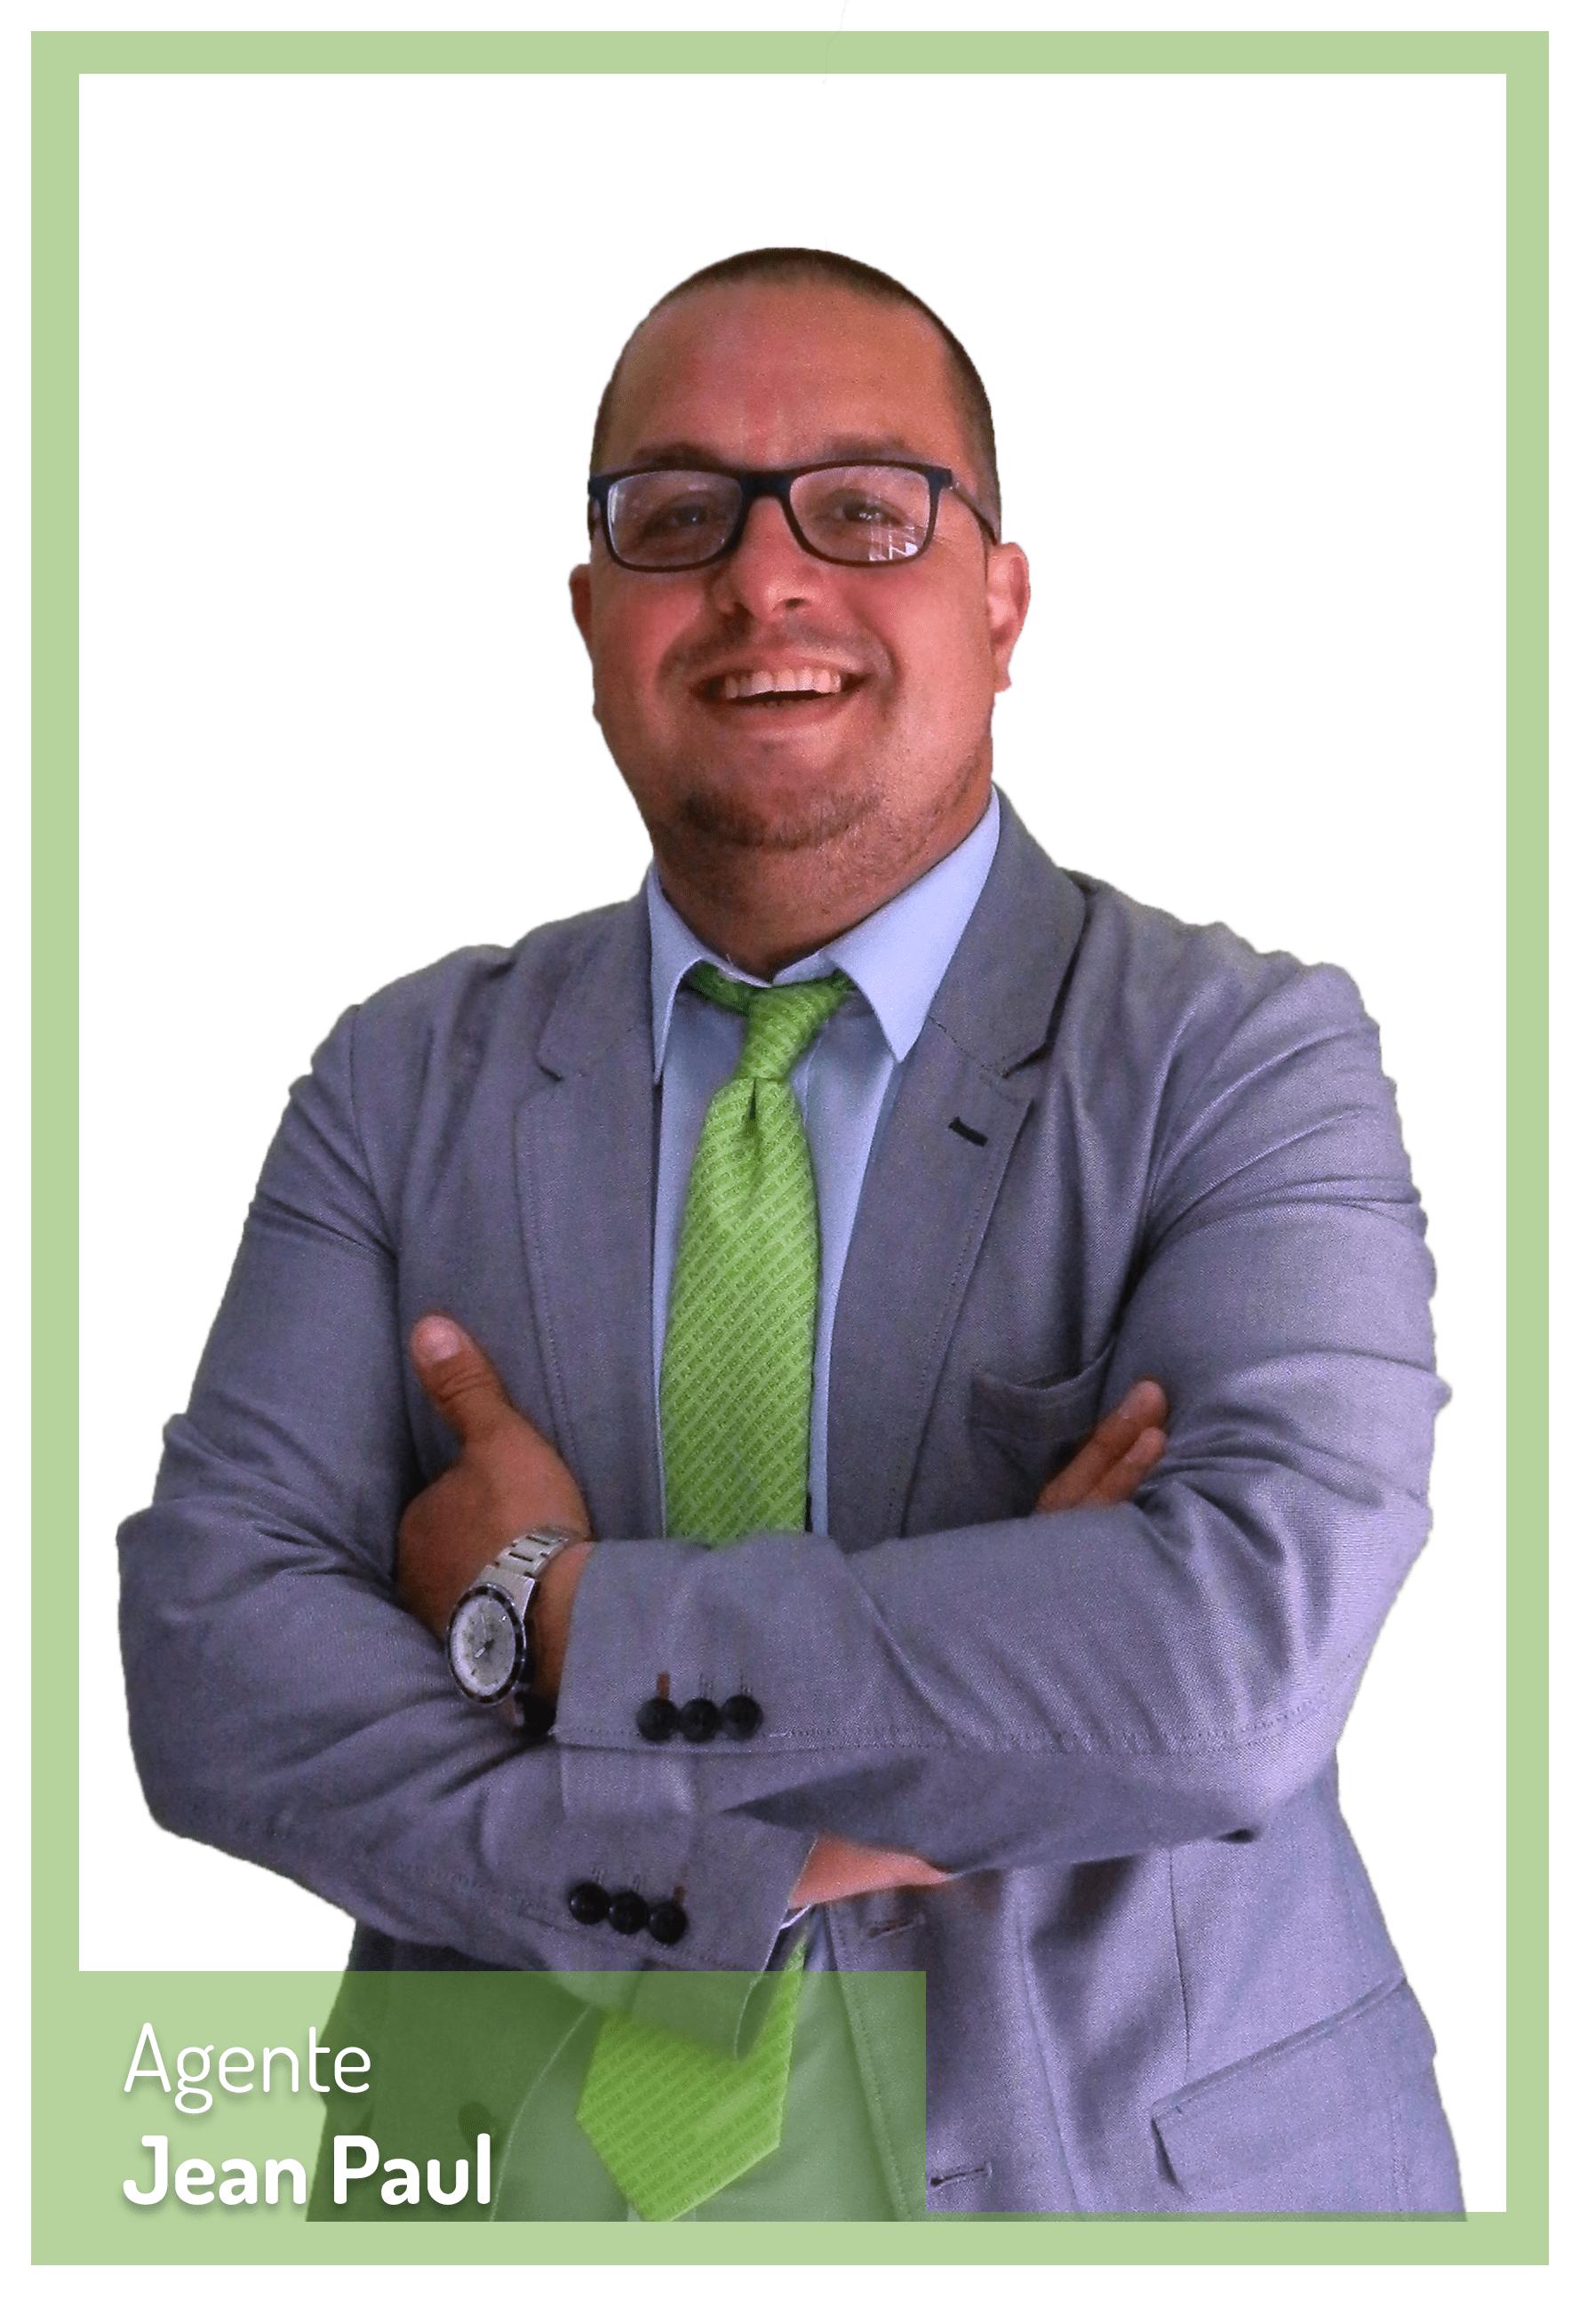 Jean Paul Planetacasa Inmobiliaria Malaga